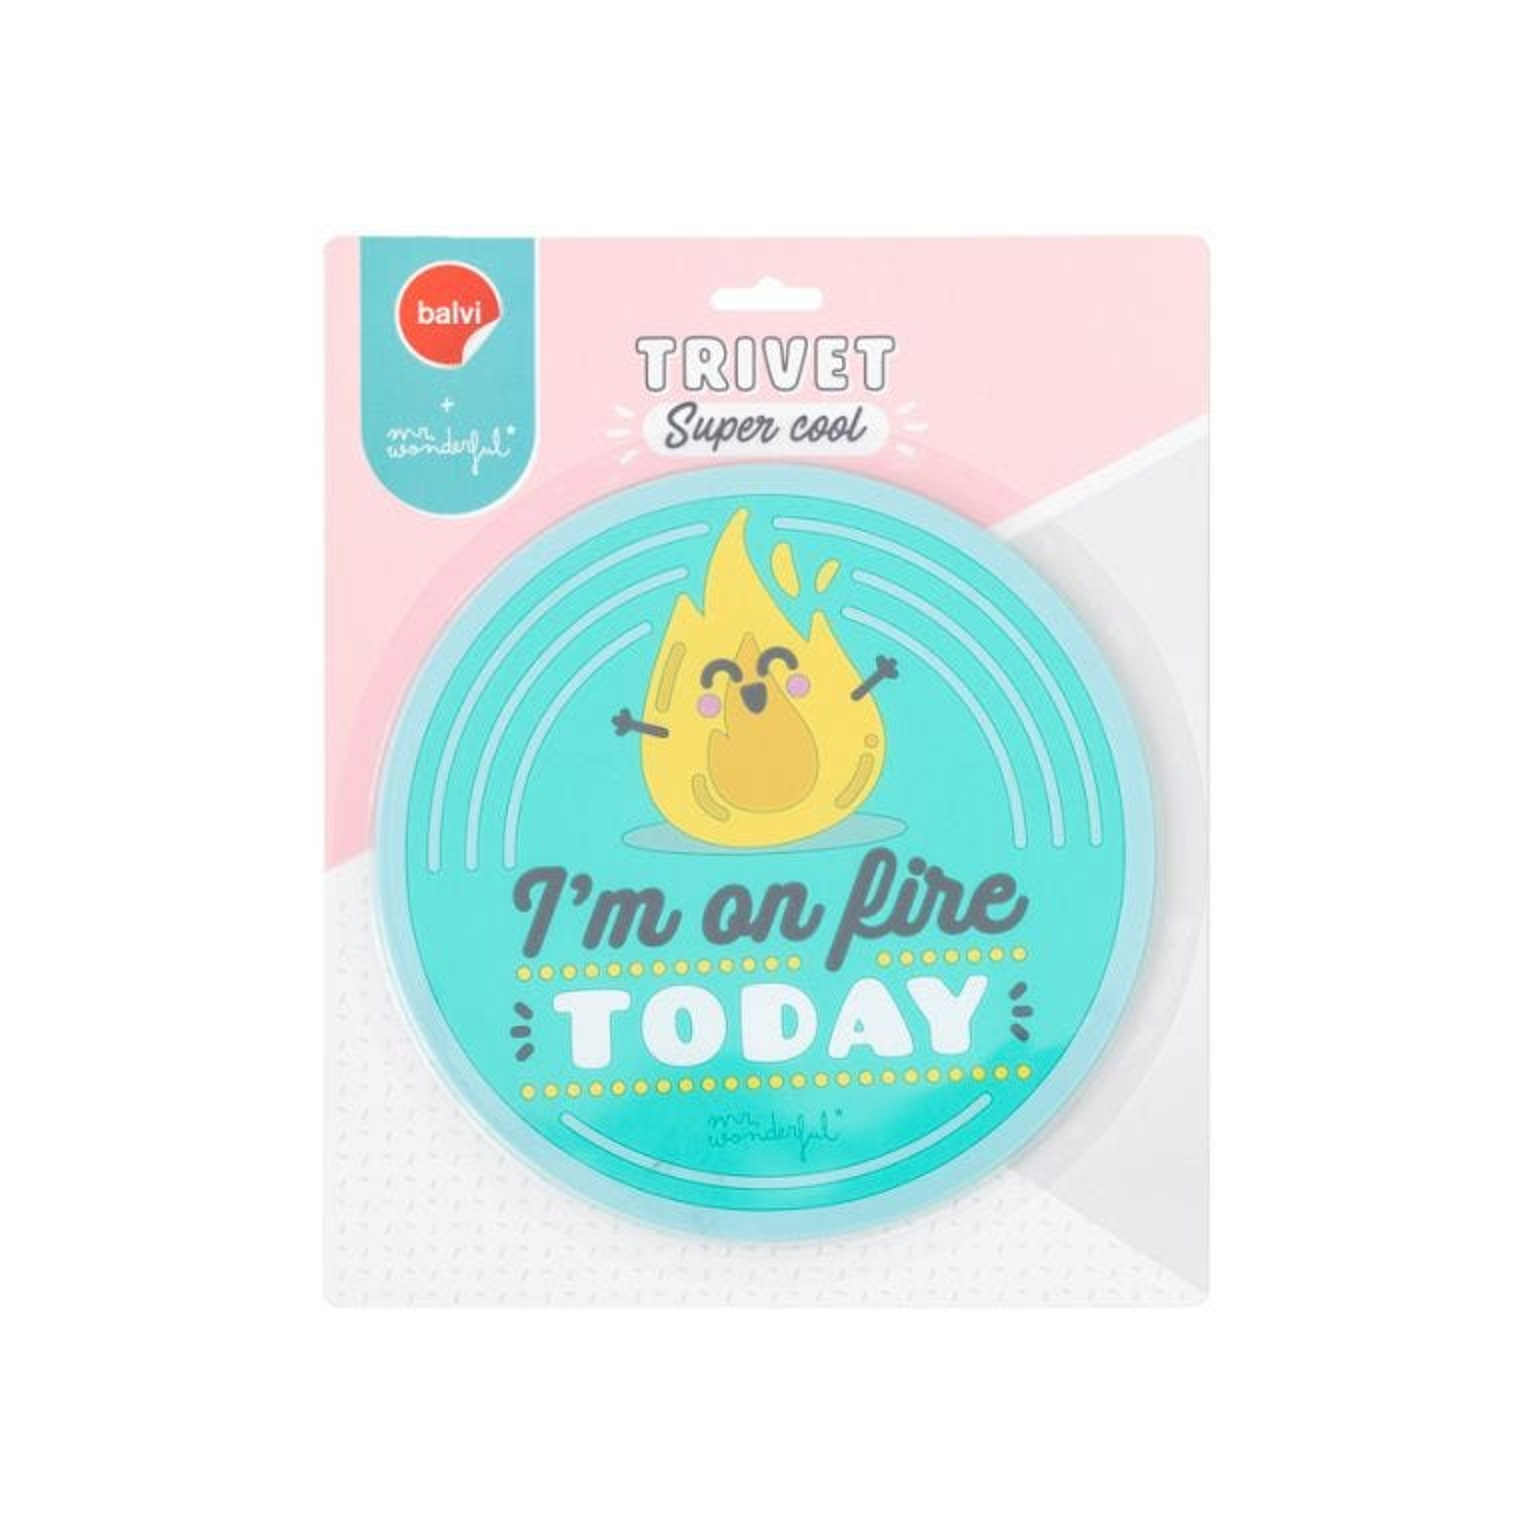 Trivet - I'm on fire today